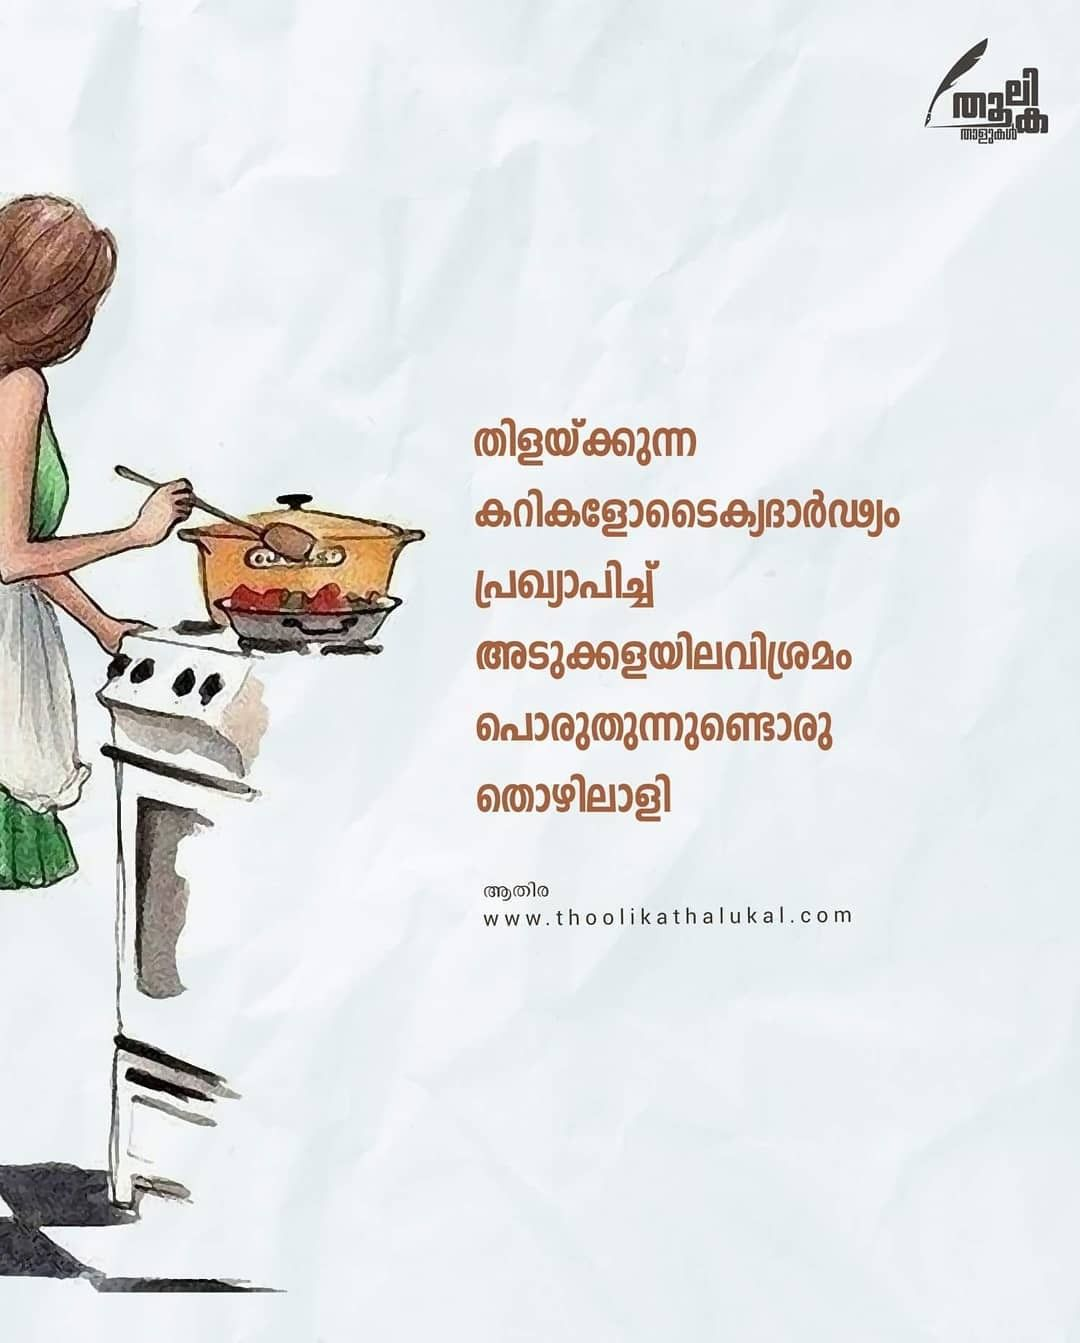 Pin By Abdussamad Edathadathil On Malayalam Quats